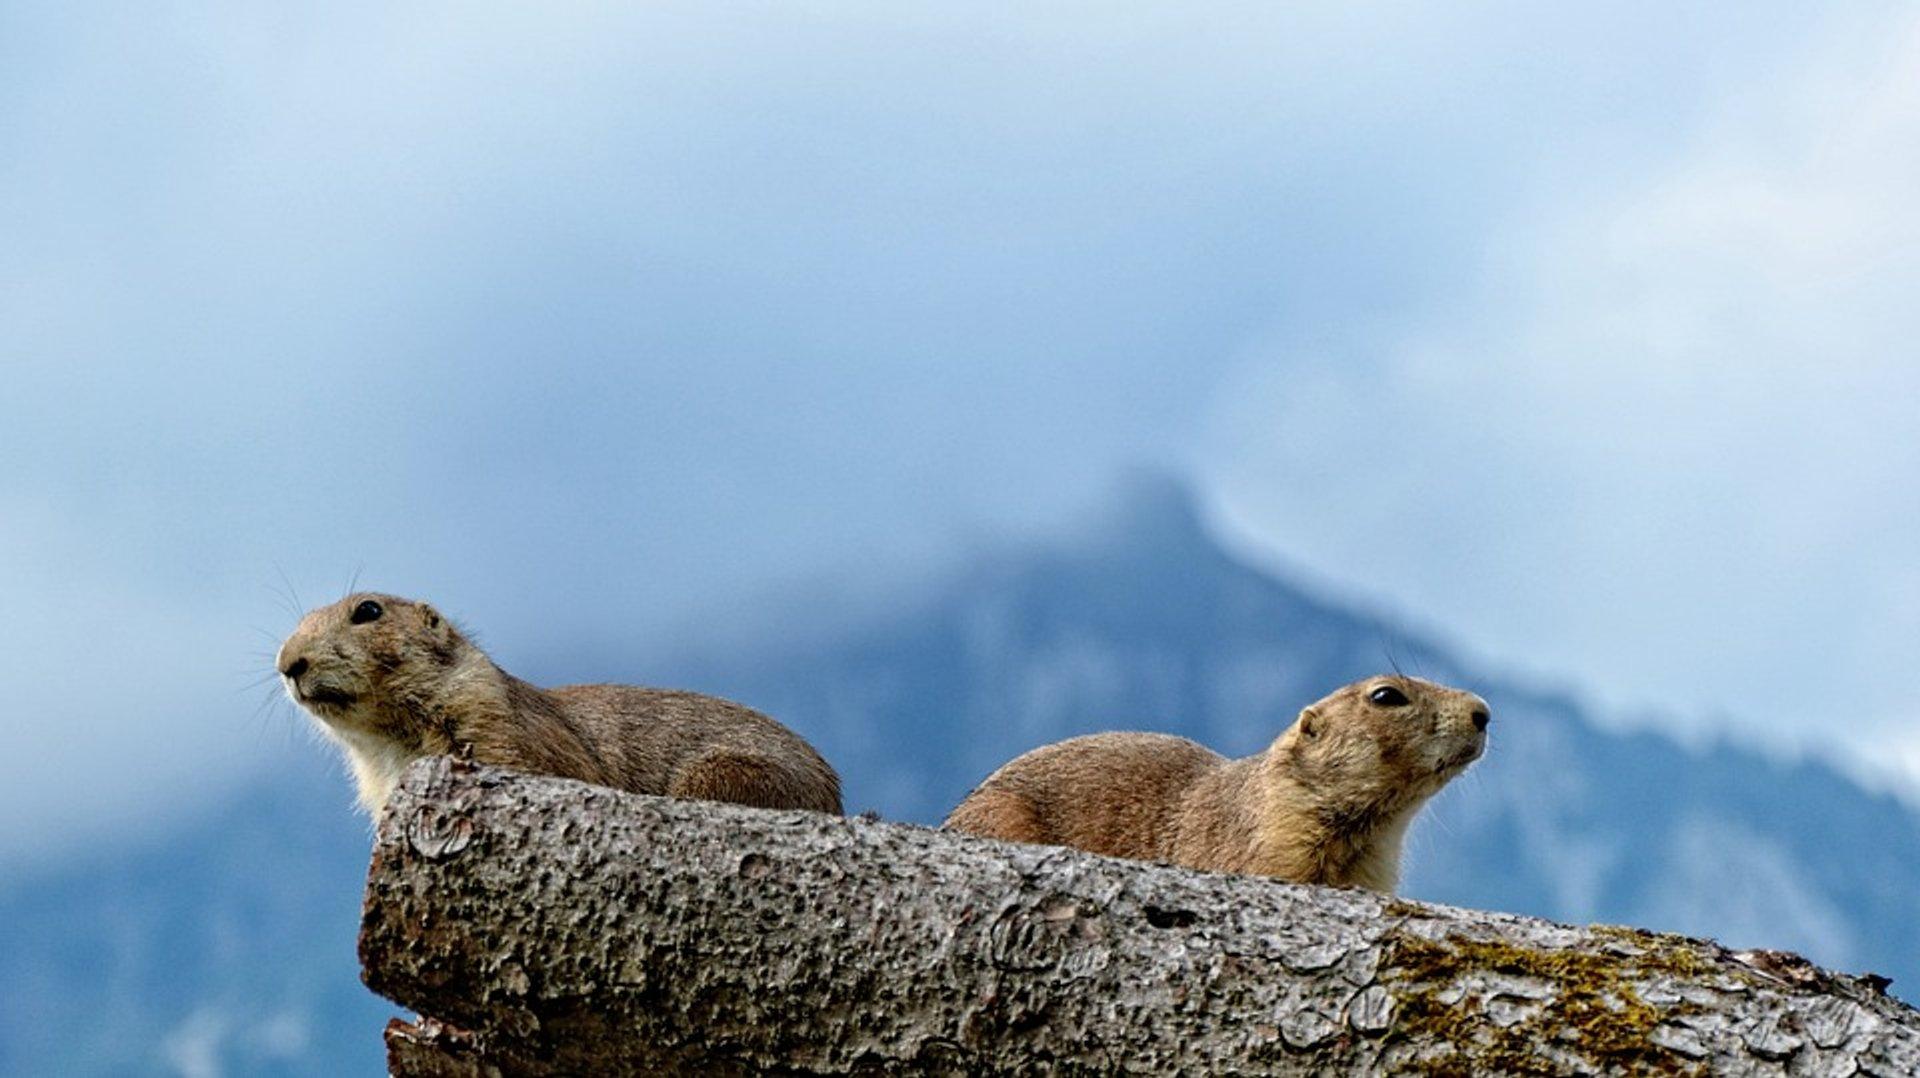 Alpine Marmots in Austria 2020 - Best Time